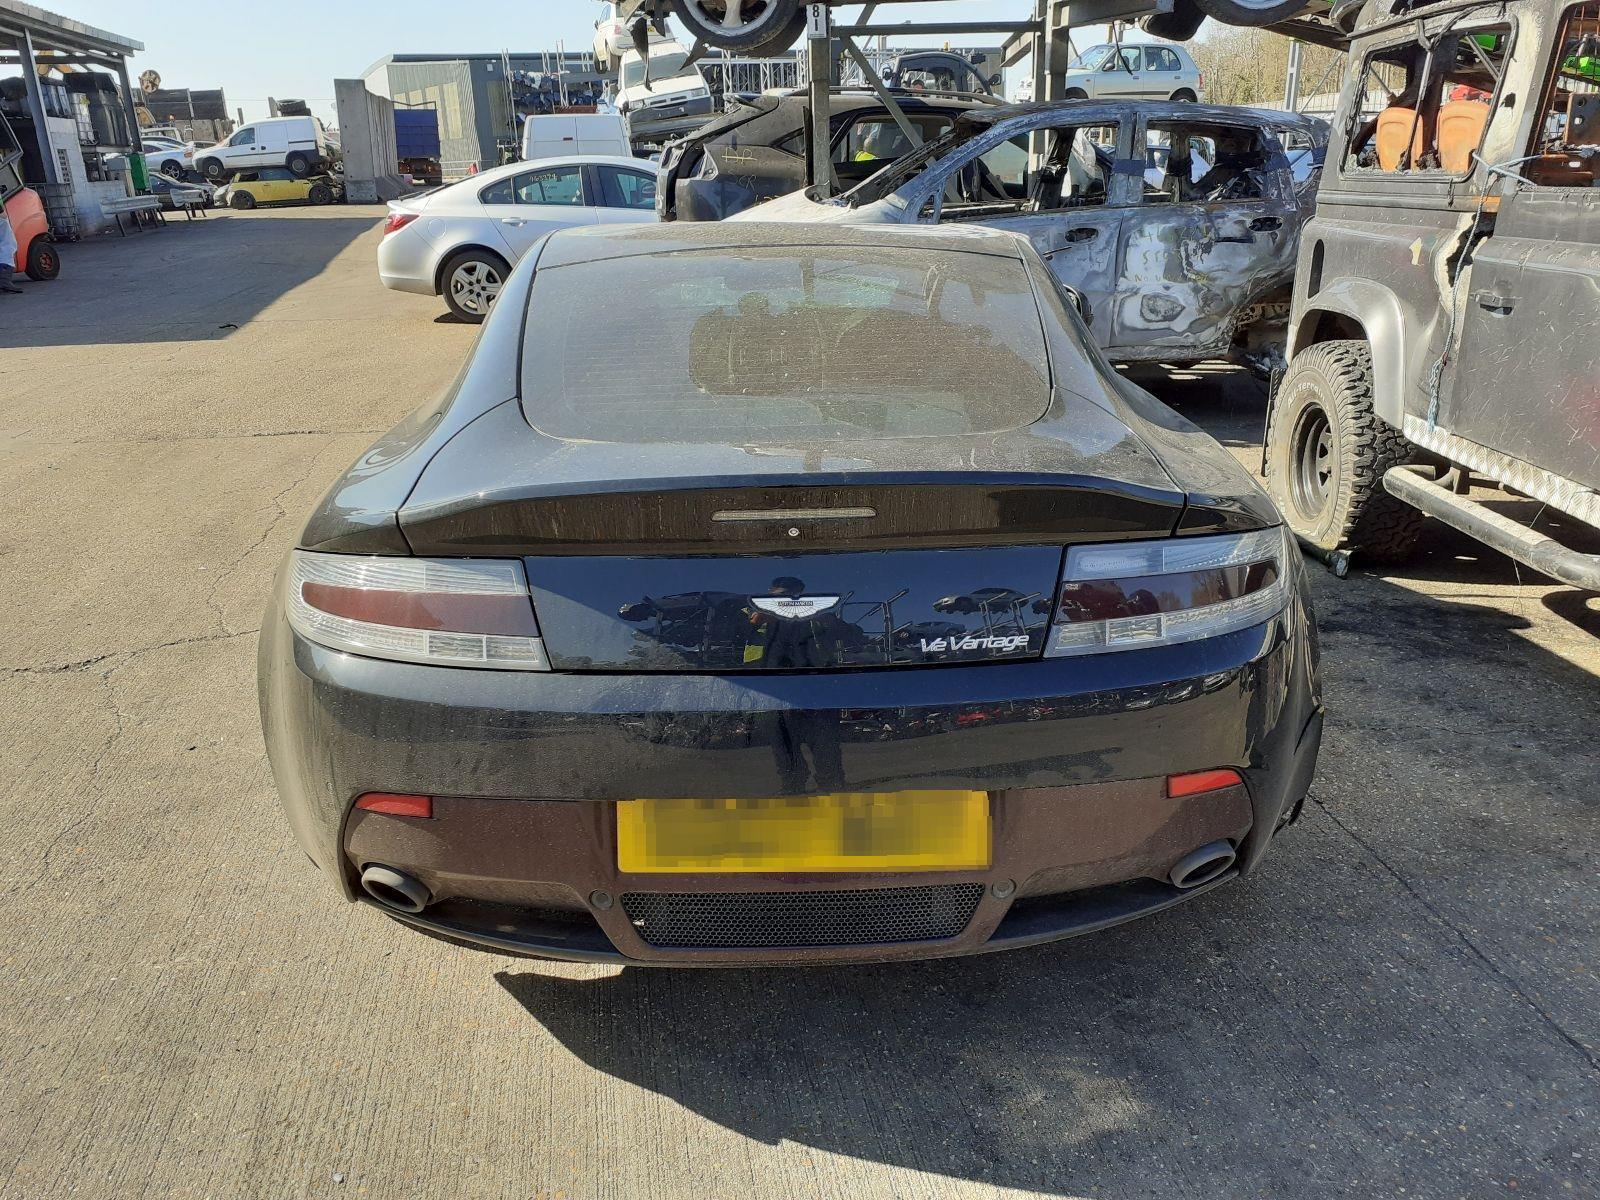 Aston Martin Vantage 2008 On V12 2 Door Coupe Scrap Salvage Car For Sale Auction Silverlake Autoparts